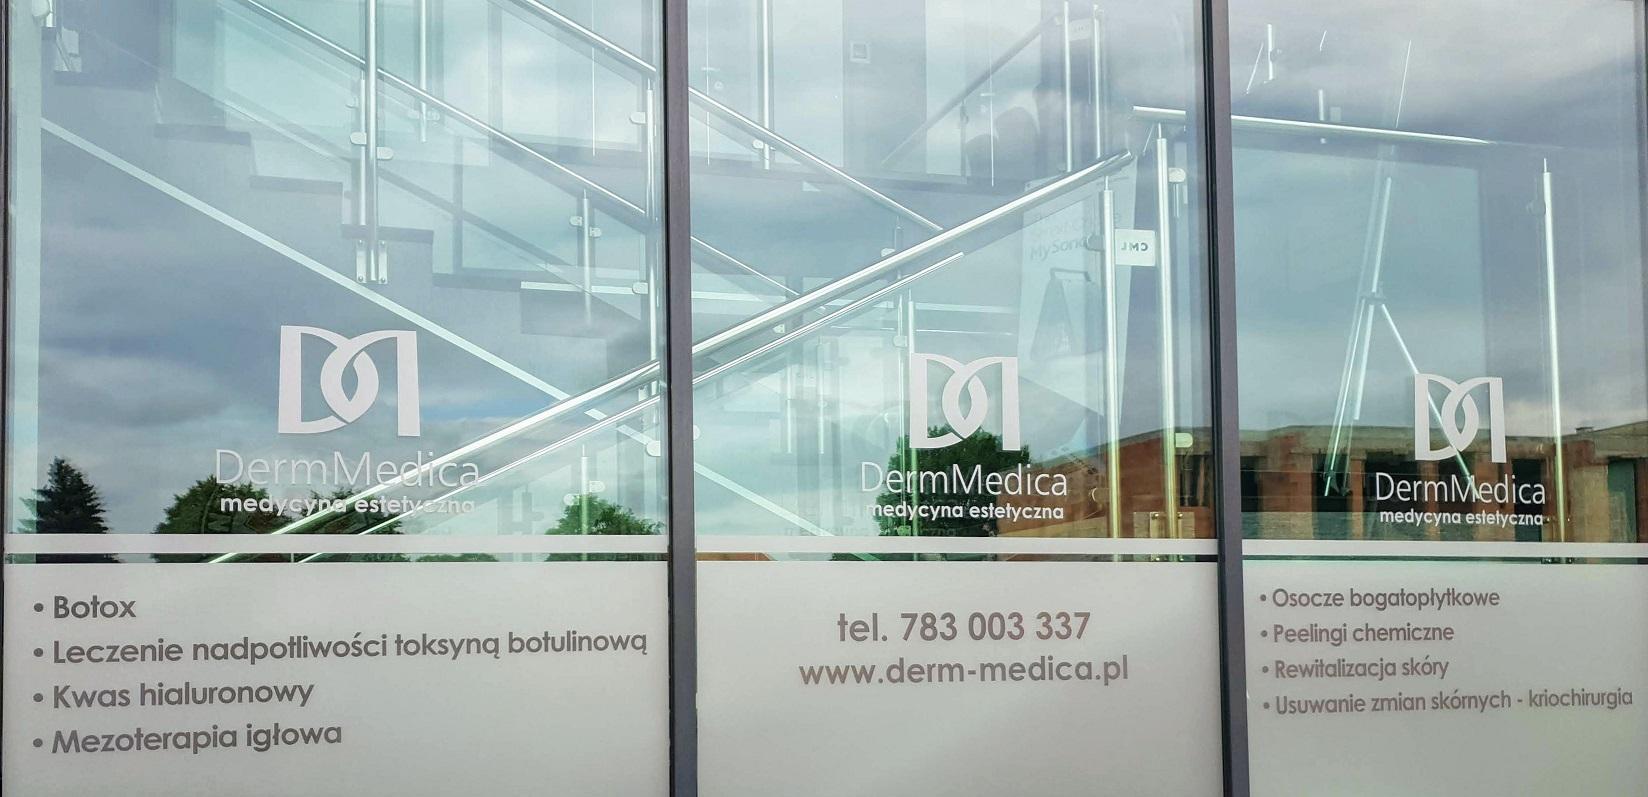 Derm-Medica